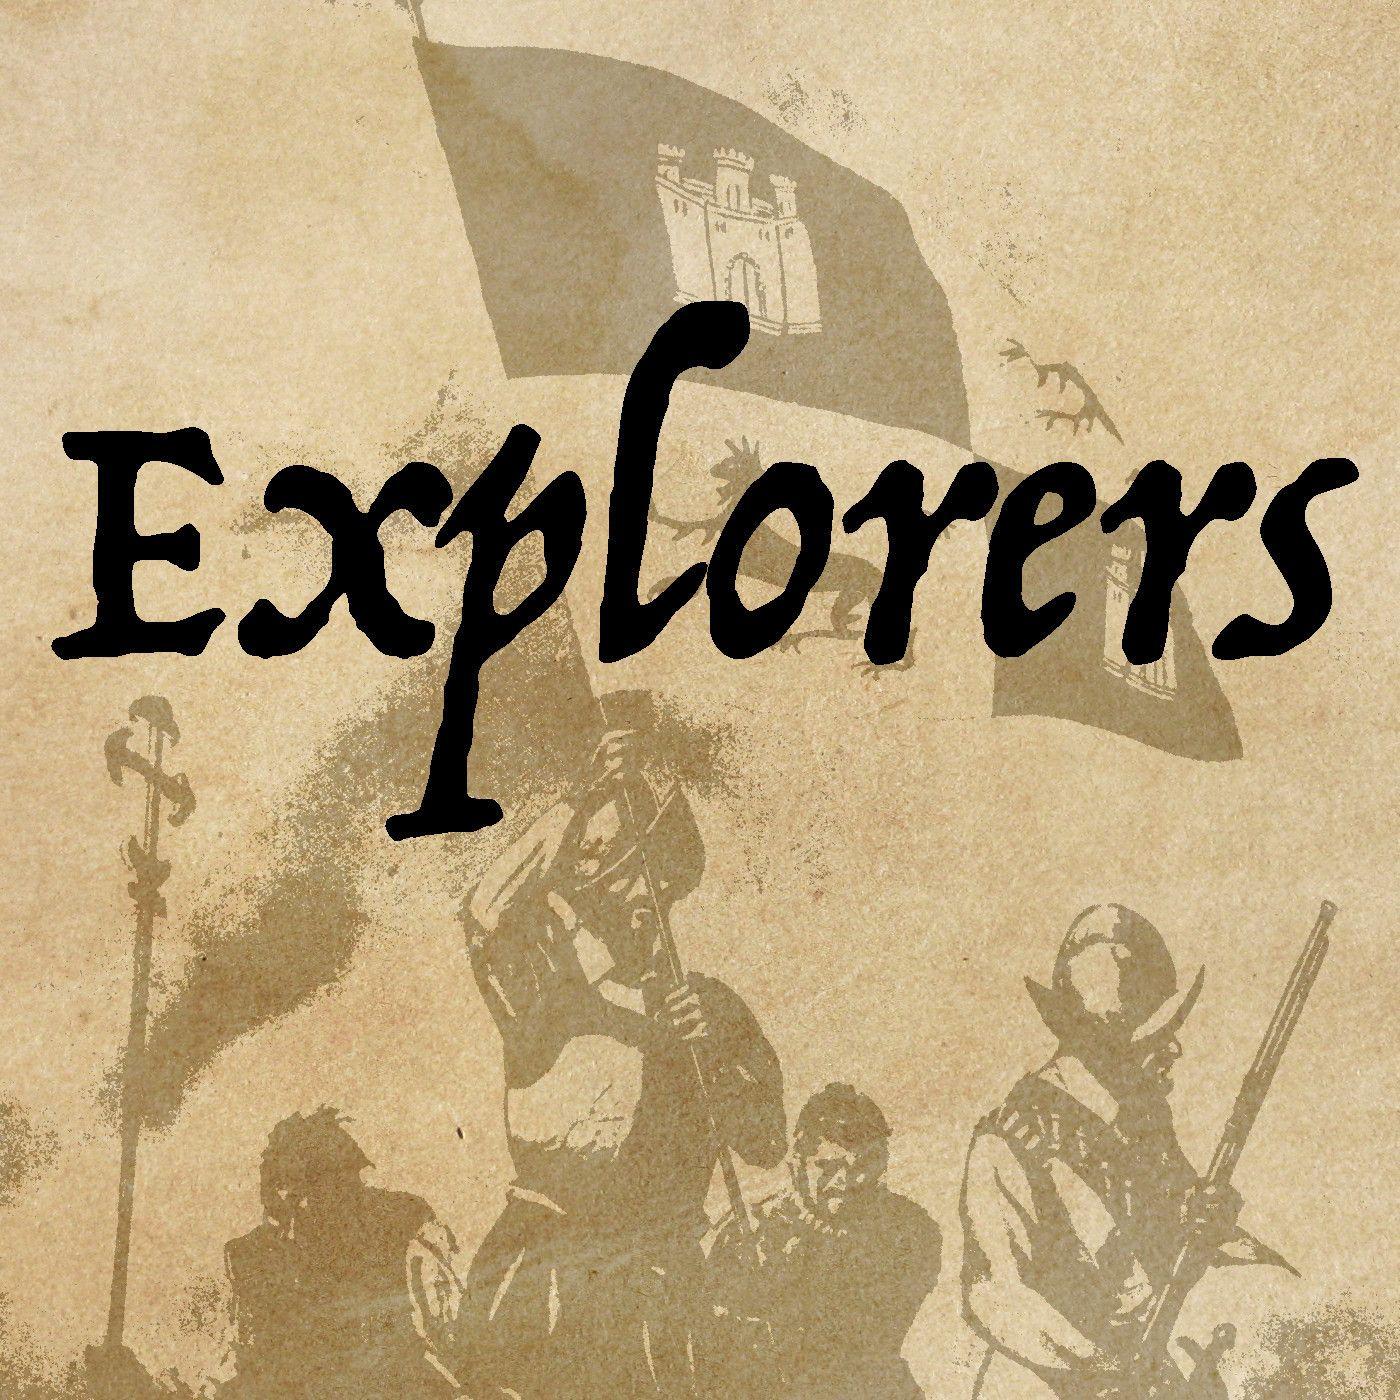 Christopher Columbus - Part 1